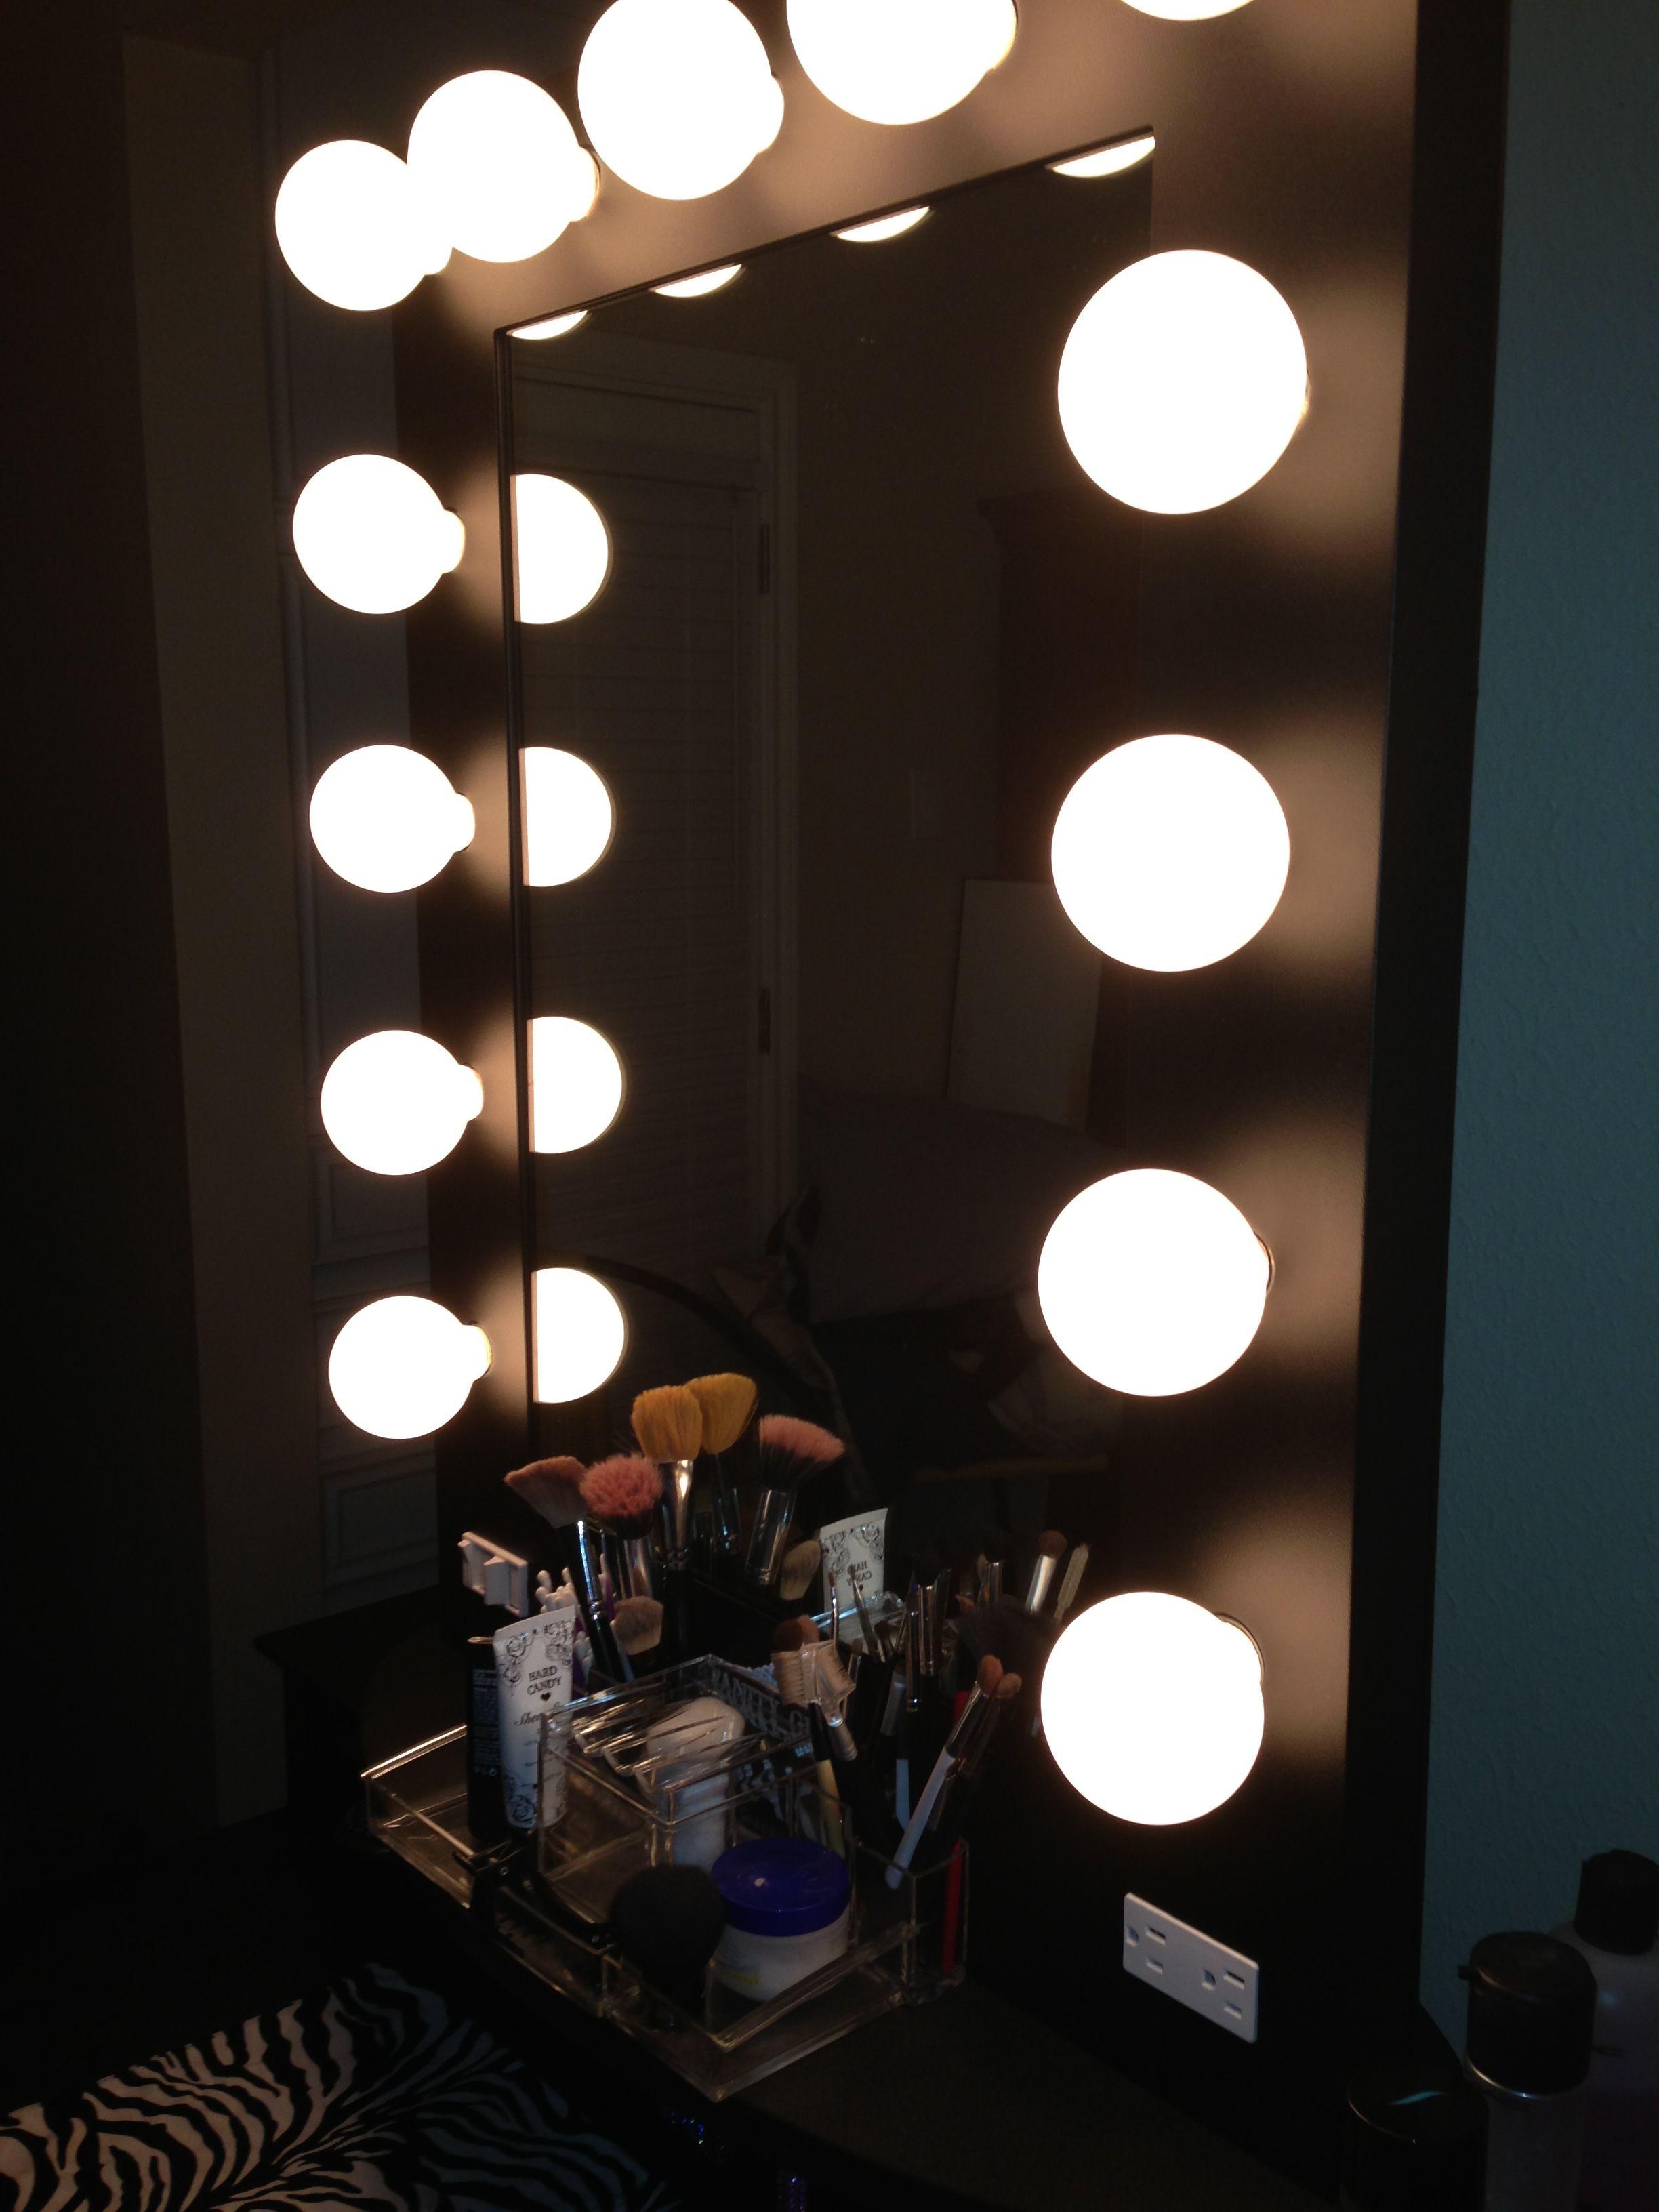 Hollywood Vanity Mirror Im Working On Getting Hubby To Make